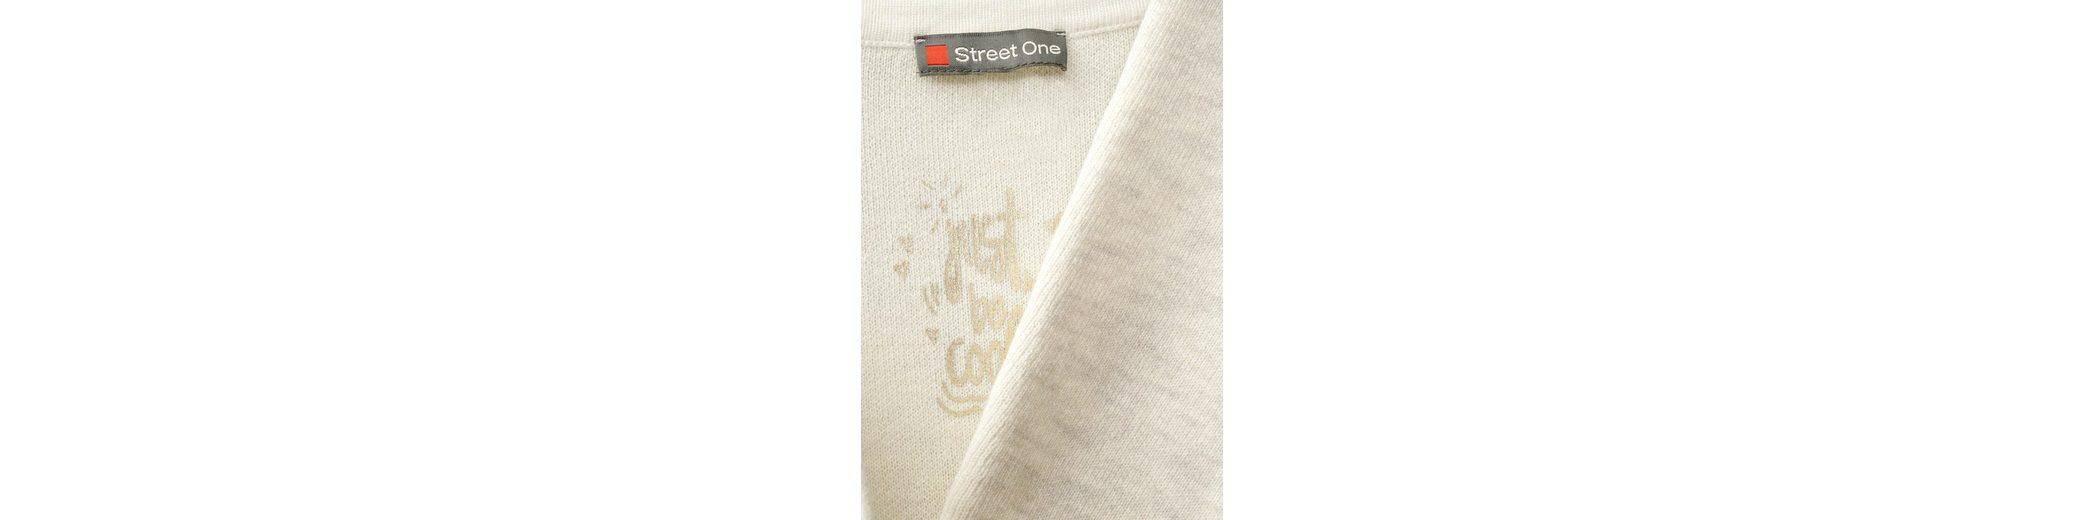 Street One Street One Long Cardigan Doubleface zzrHxOS